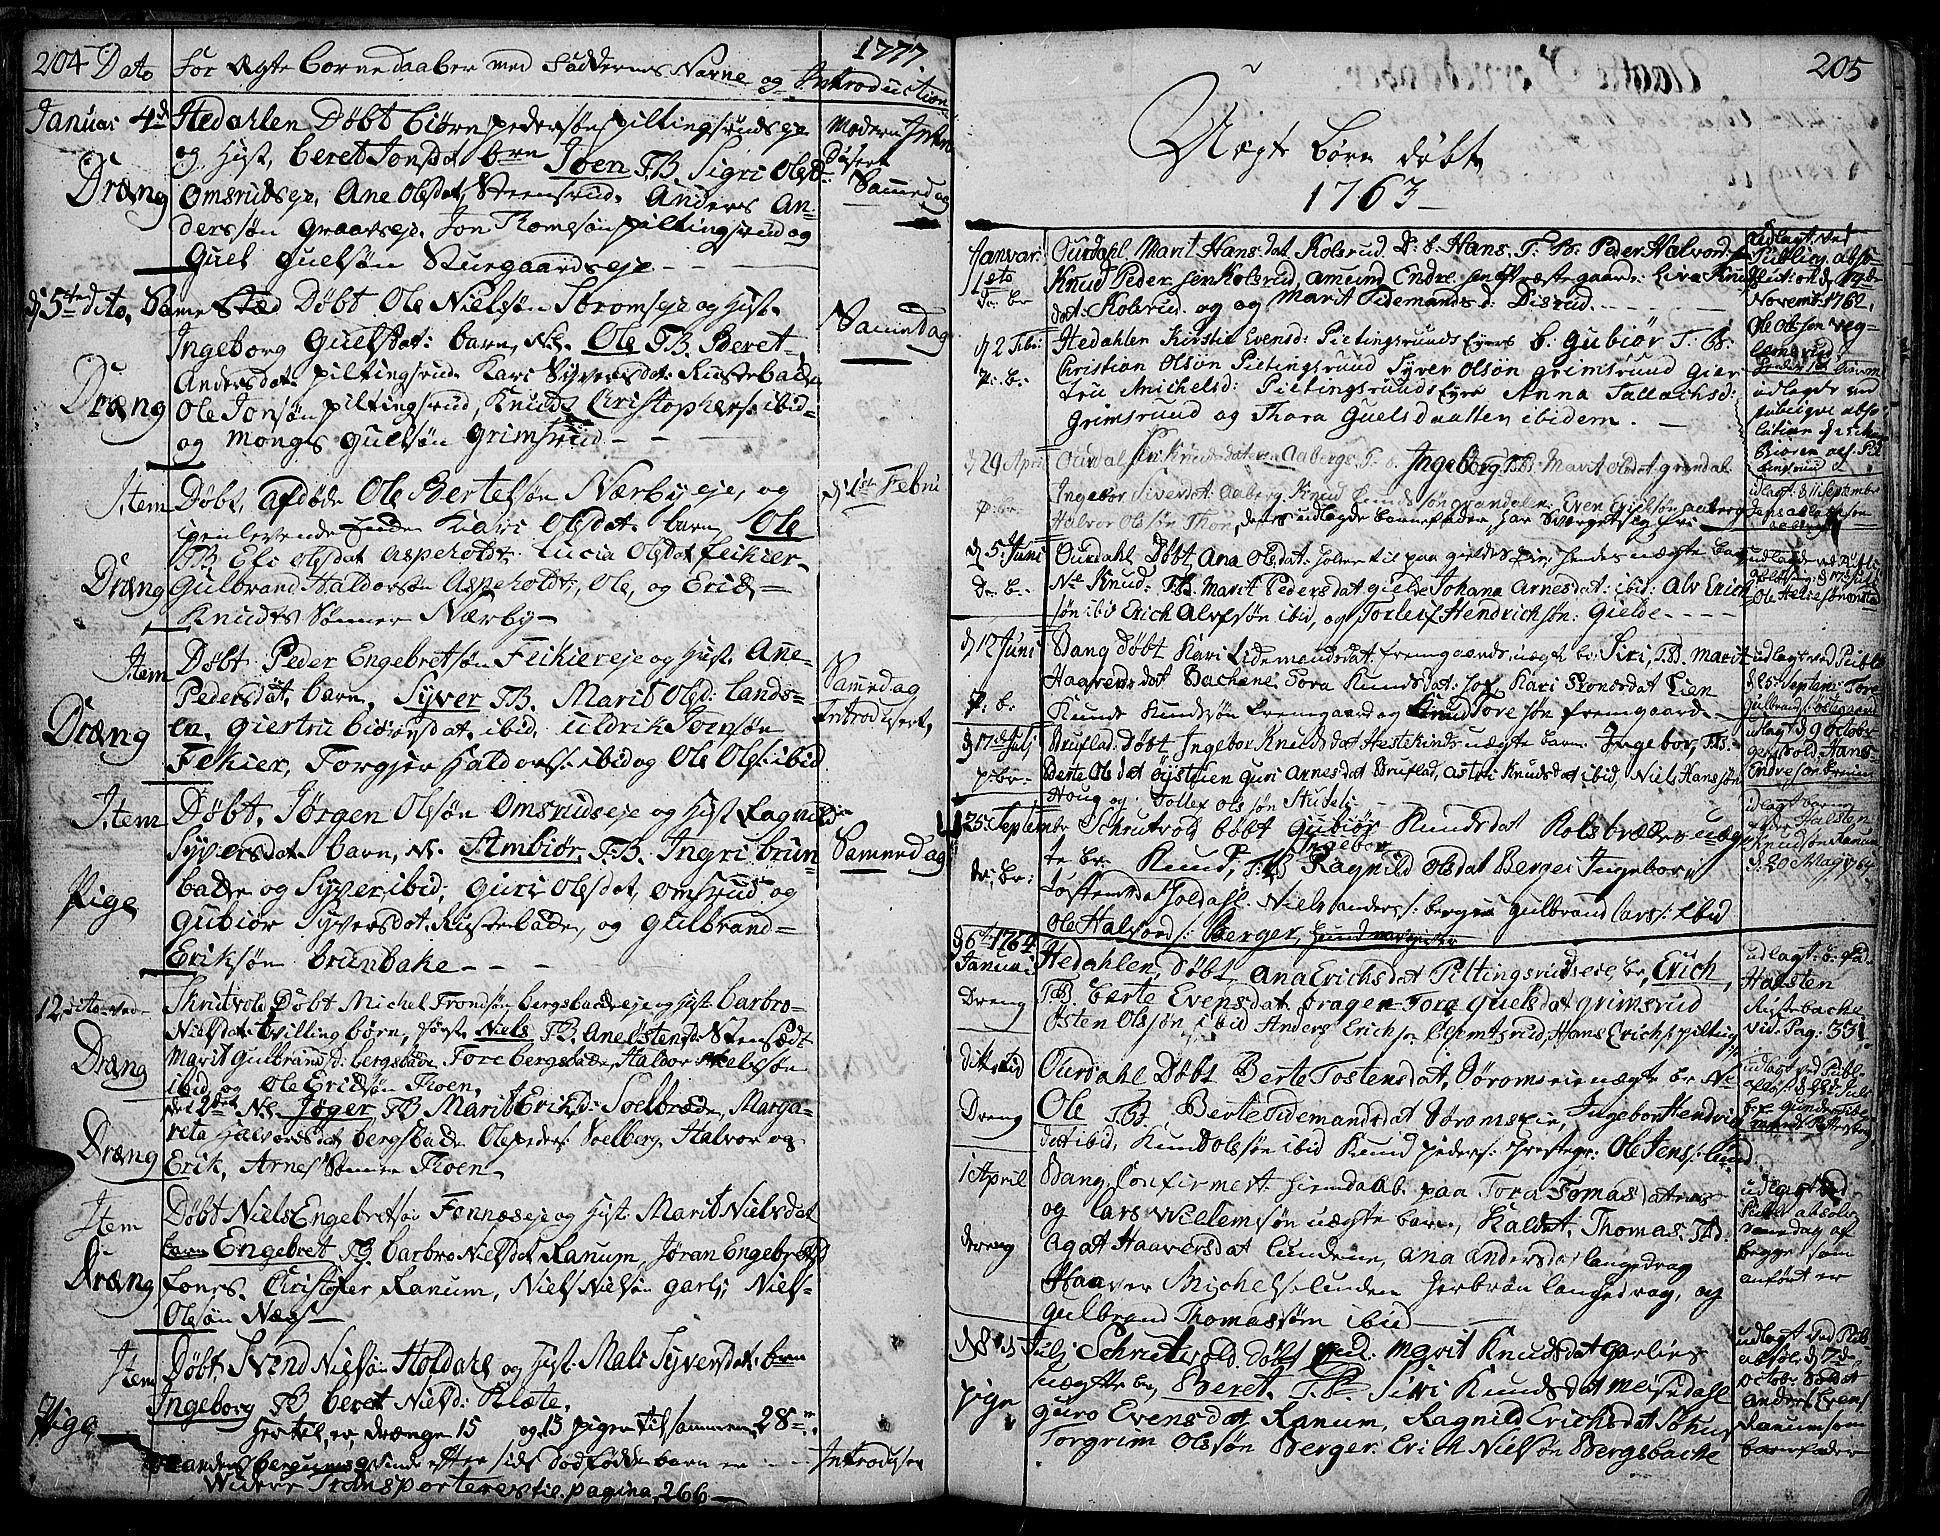 SAH, Aurdal prestekontor, Ministerialbok nr. 5, 1763-1781, s. 204-205